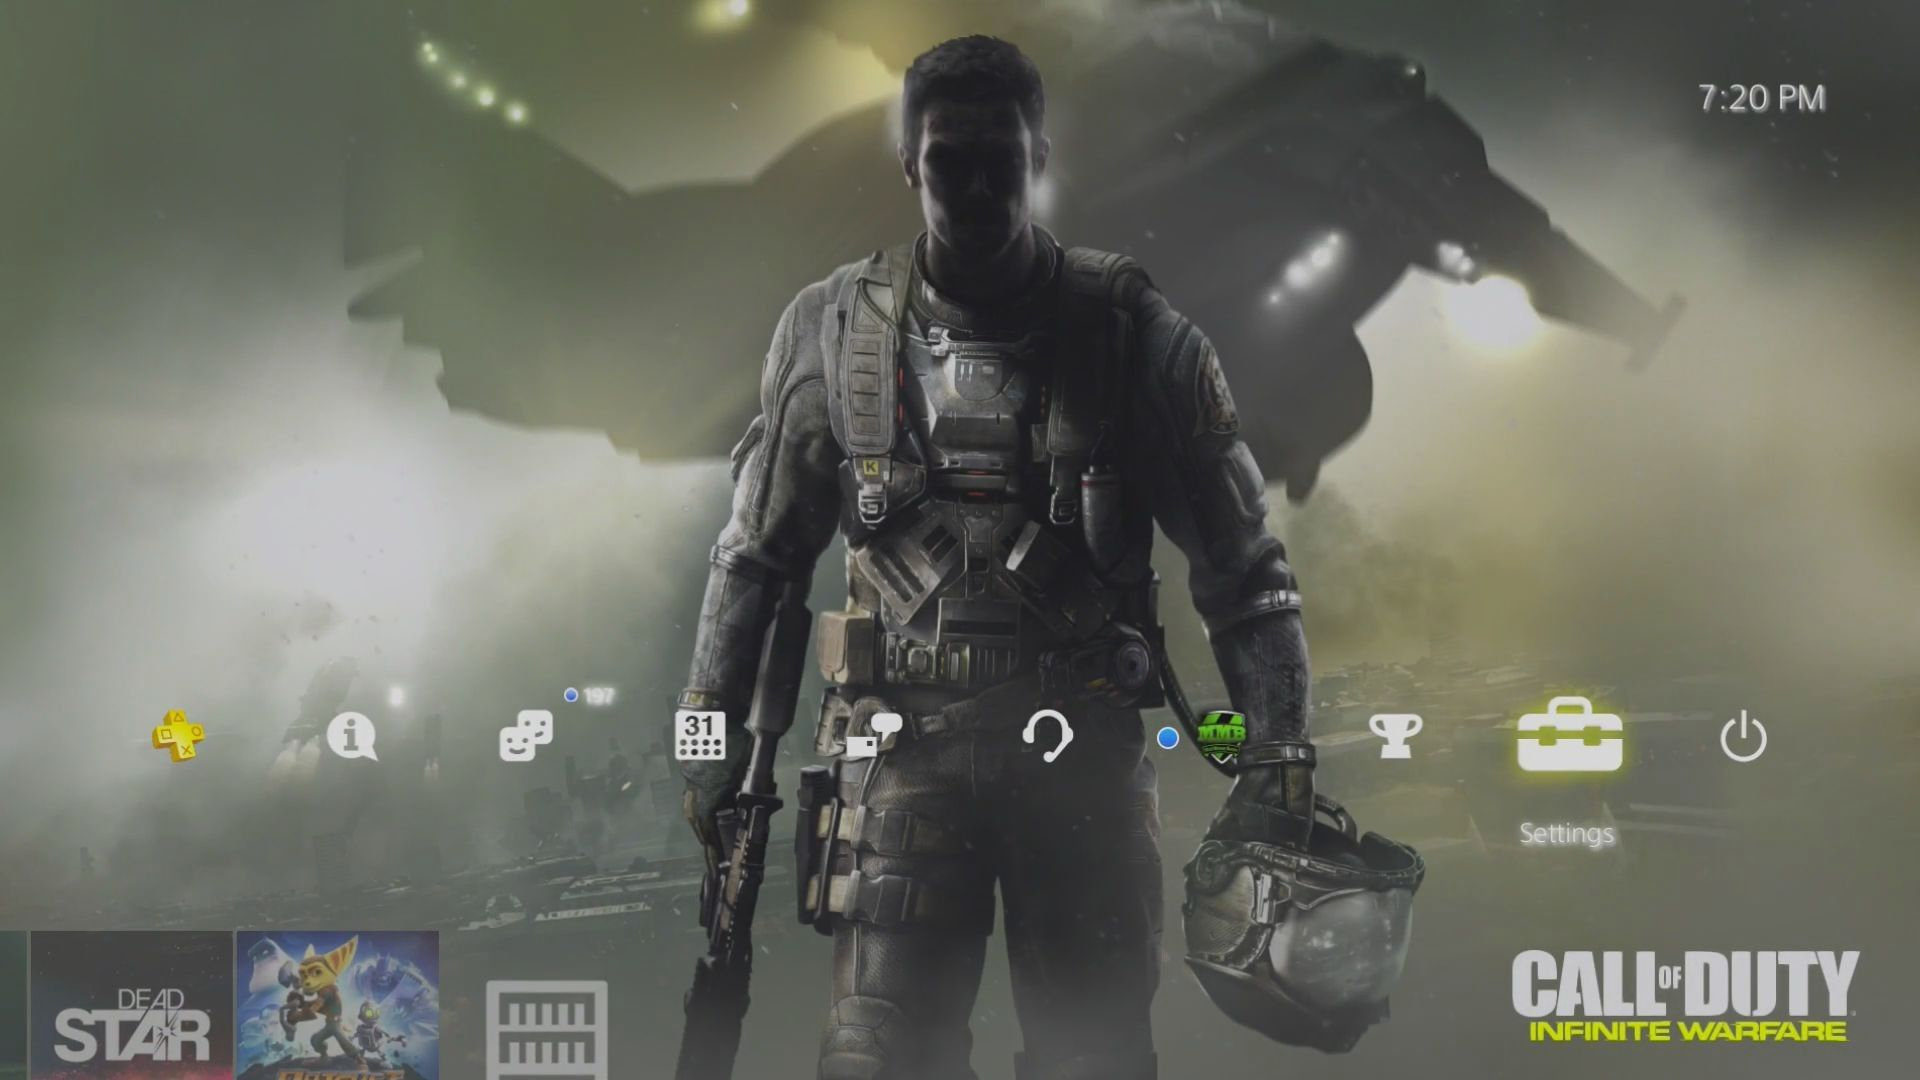 Wallpaper Call Of Duty Infinite Warfare Multiplayer K Games 1600x800 Wallpapers 34